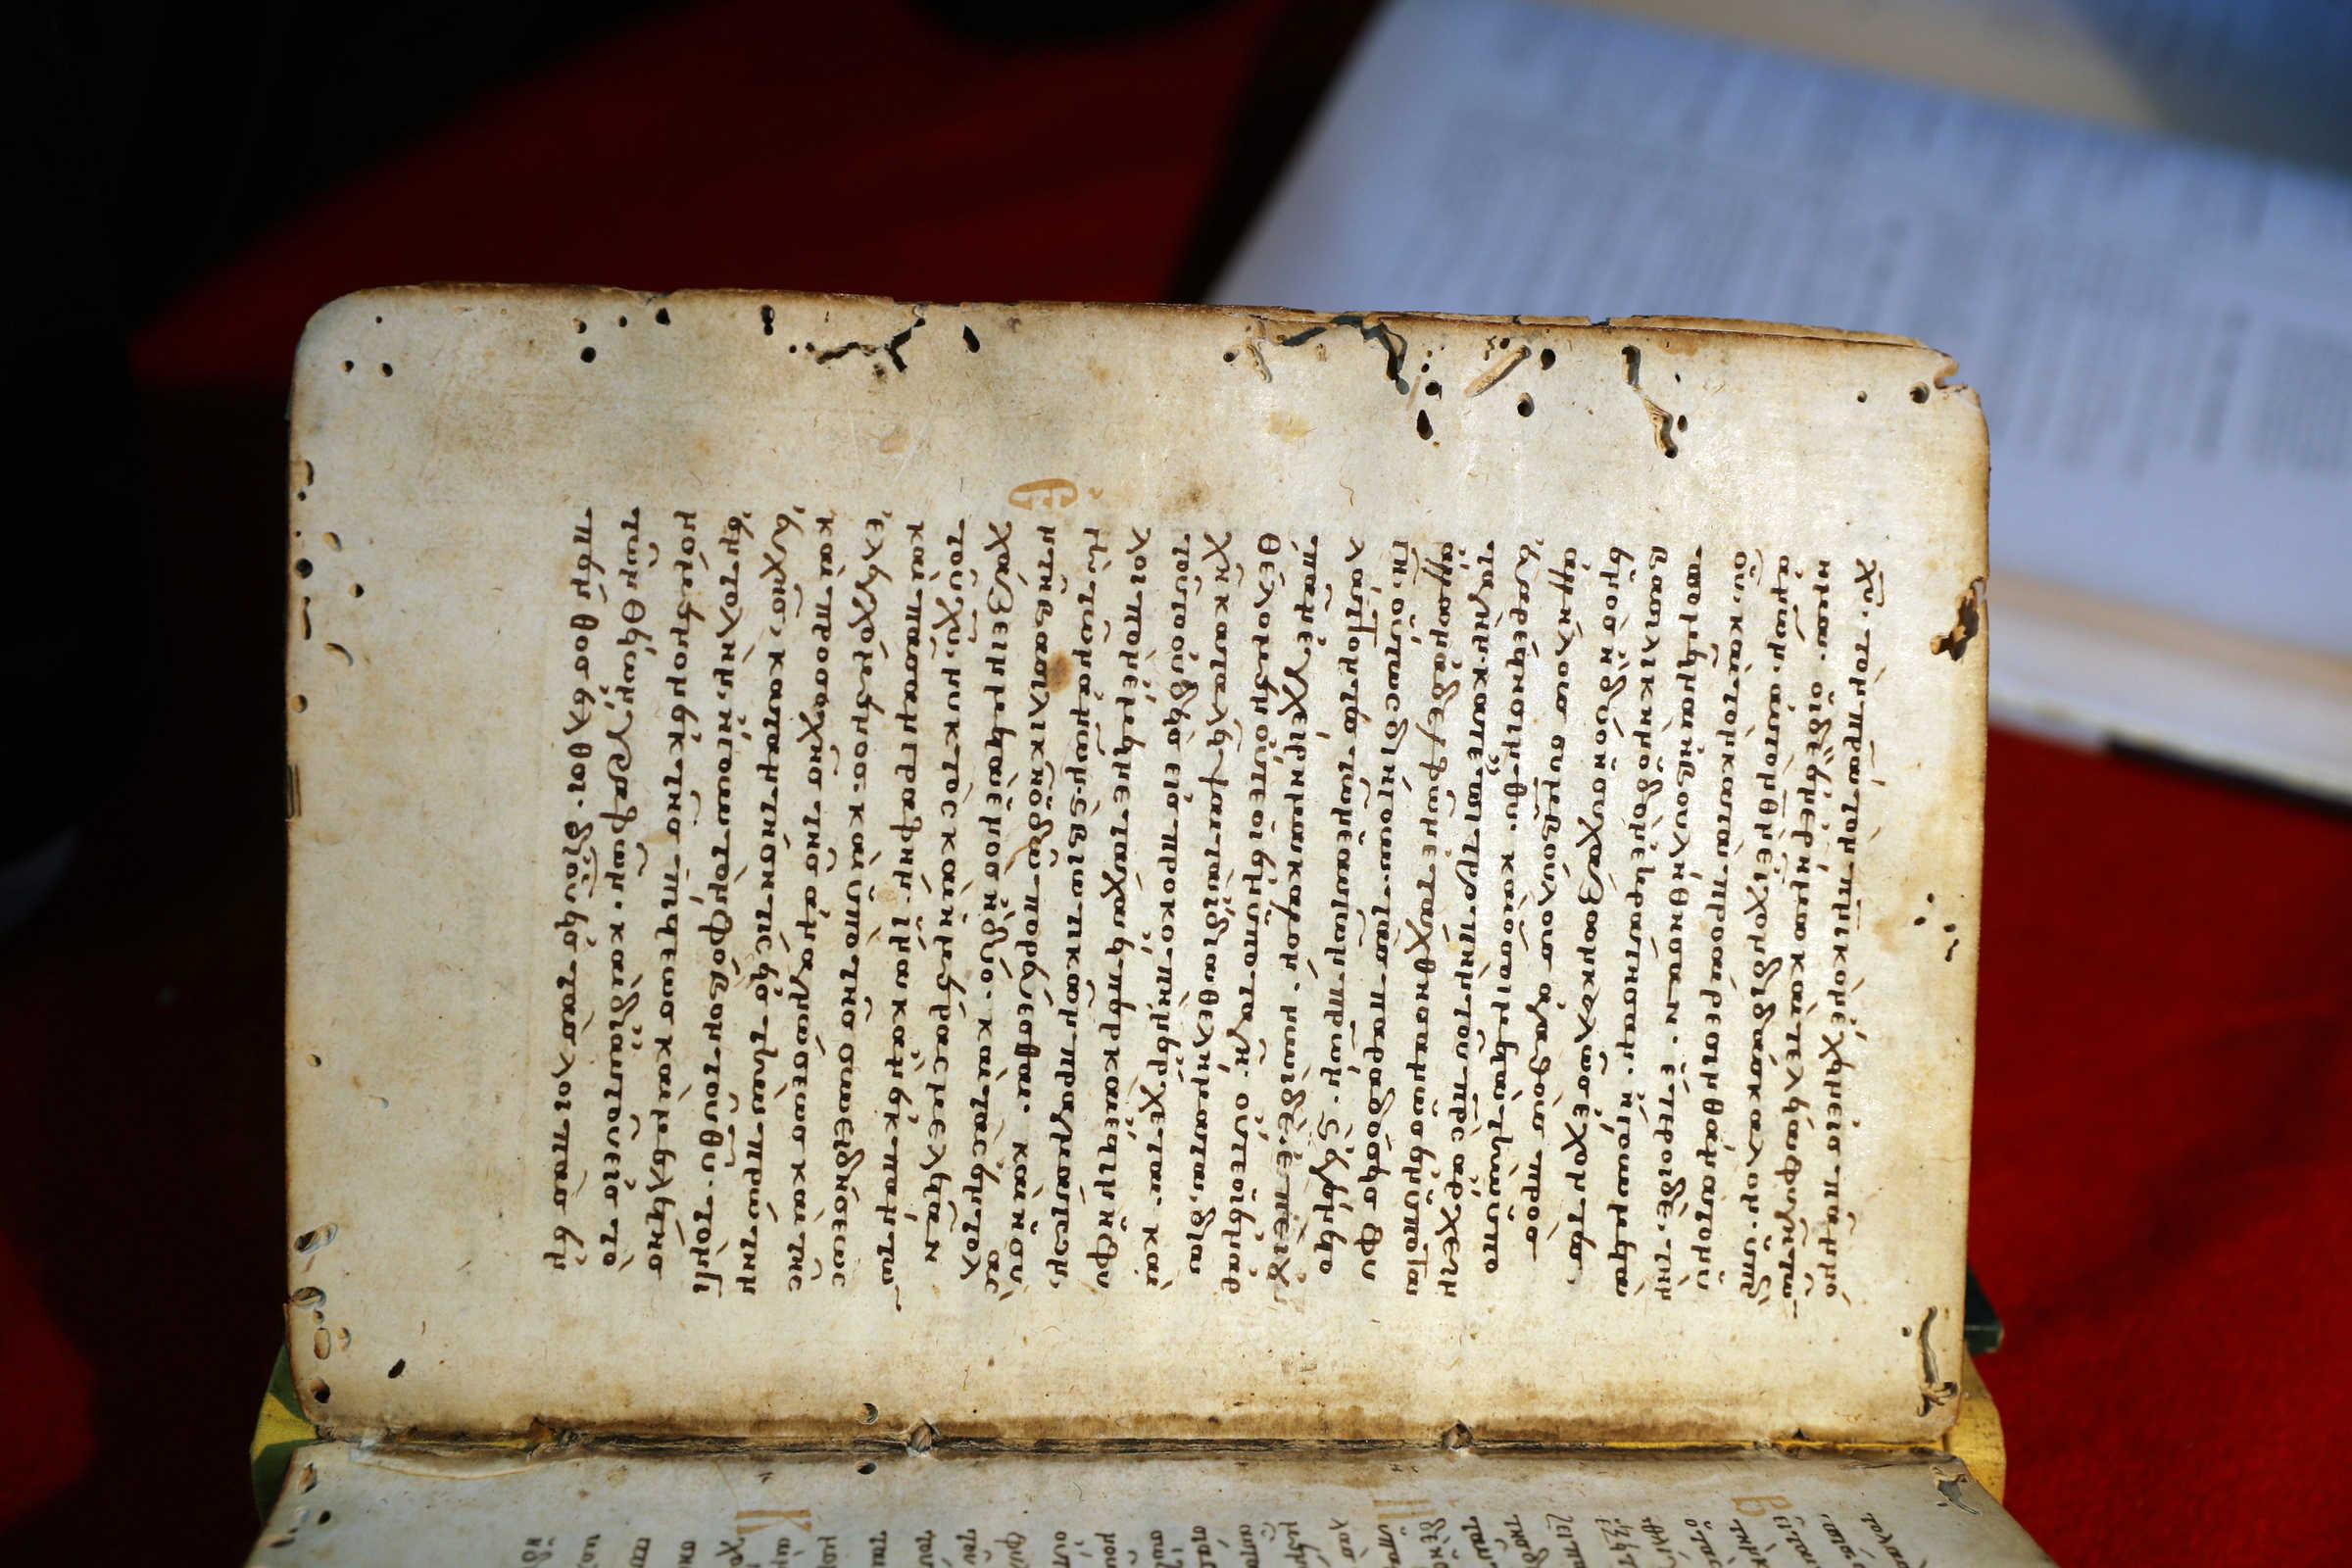 Filocalia: Definiție, istorie, sursă - (C) Vatopedi monastery, Mount Athos